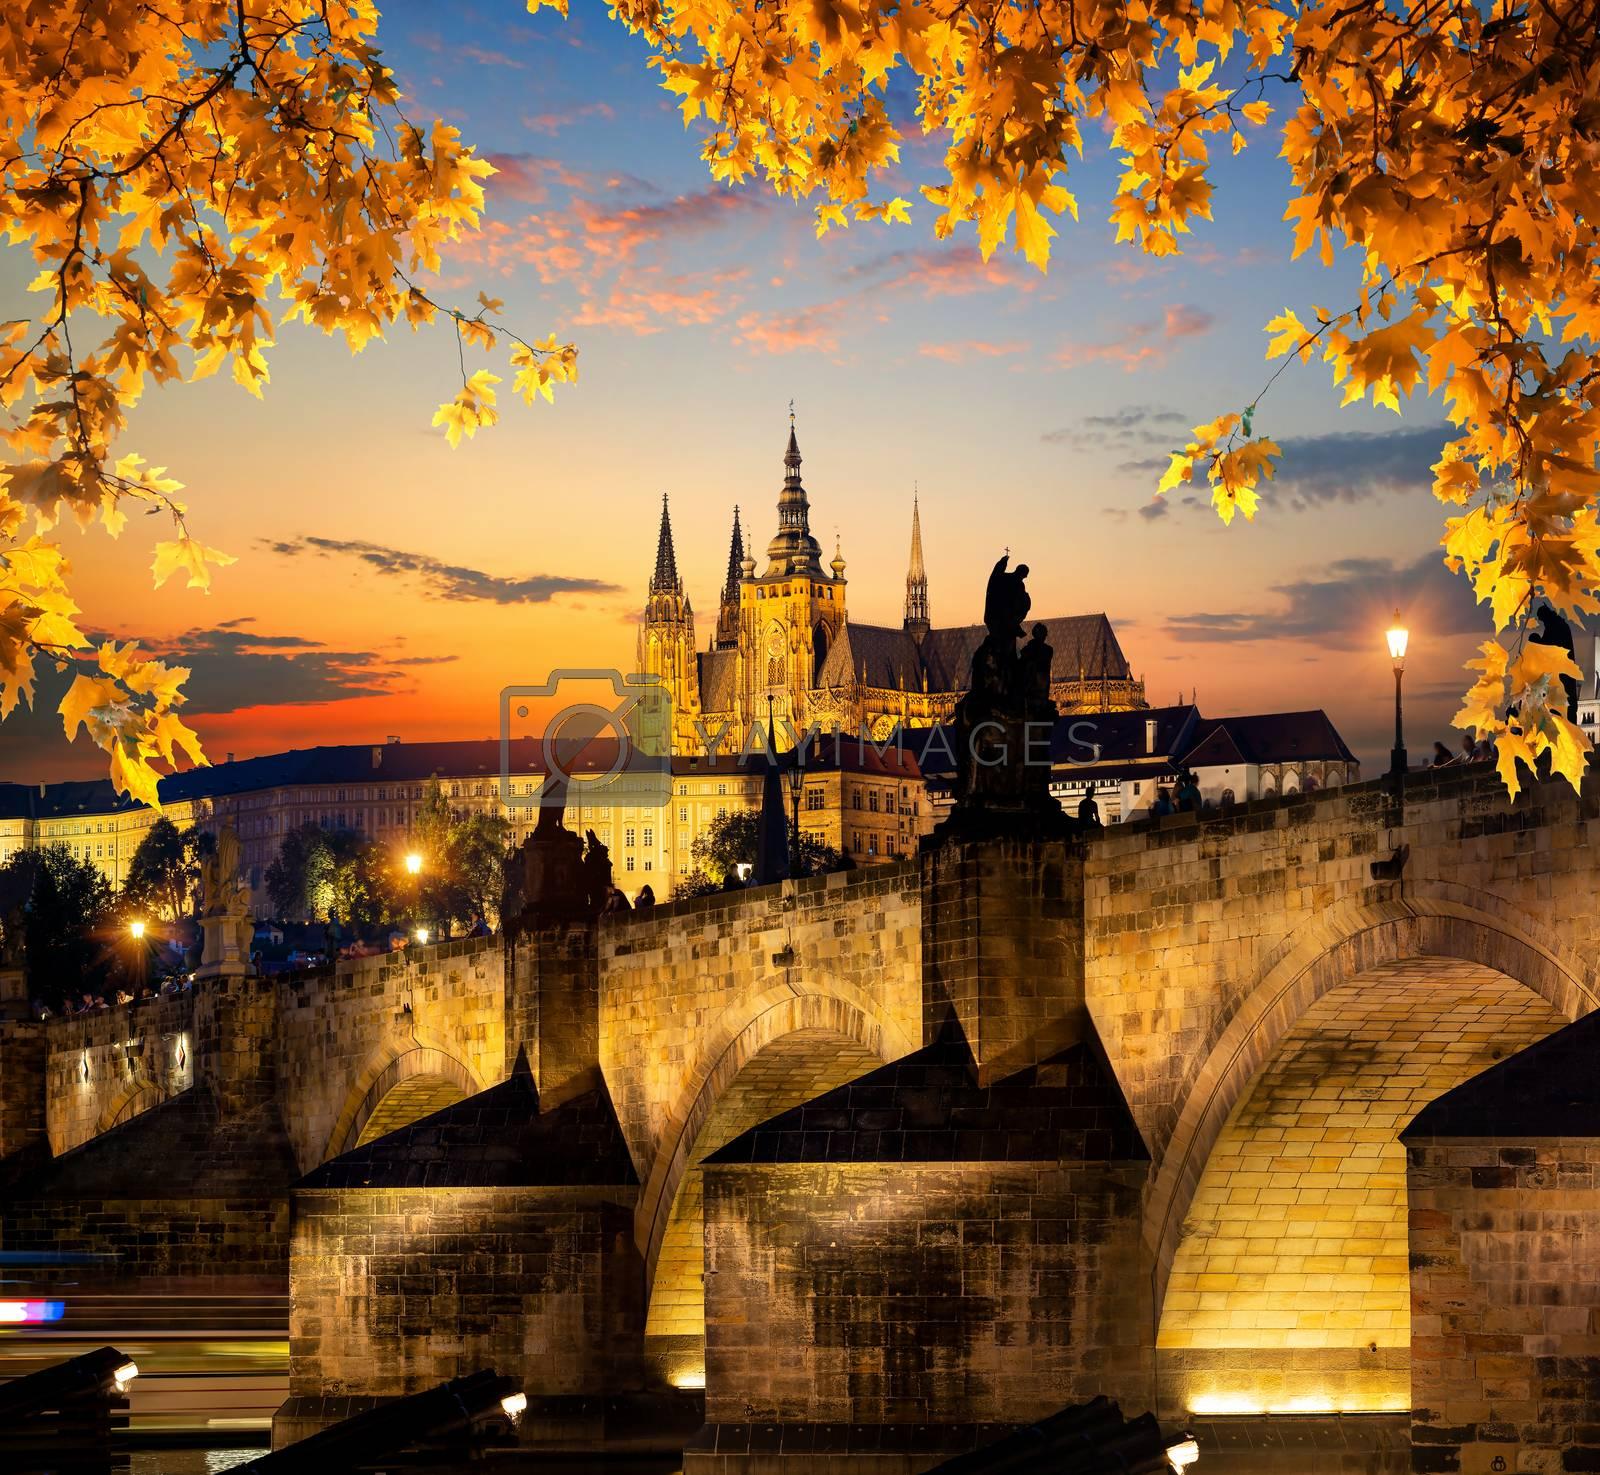 Illuminated Charles Bridge on river Vltava in Prague at sunset